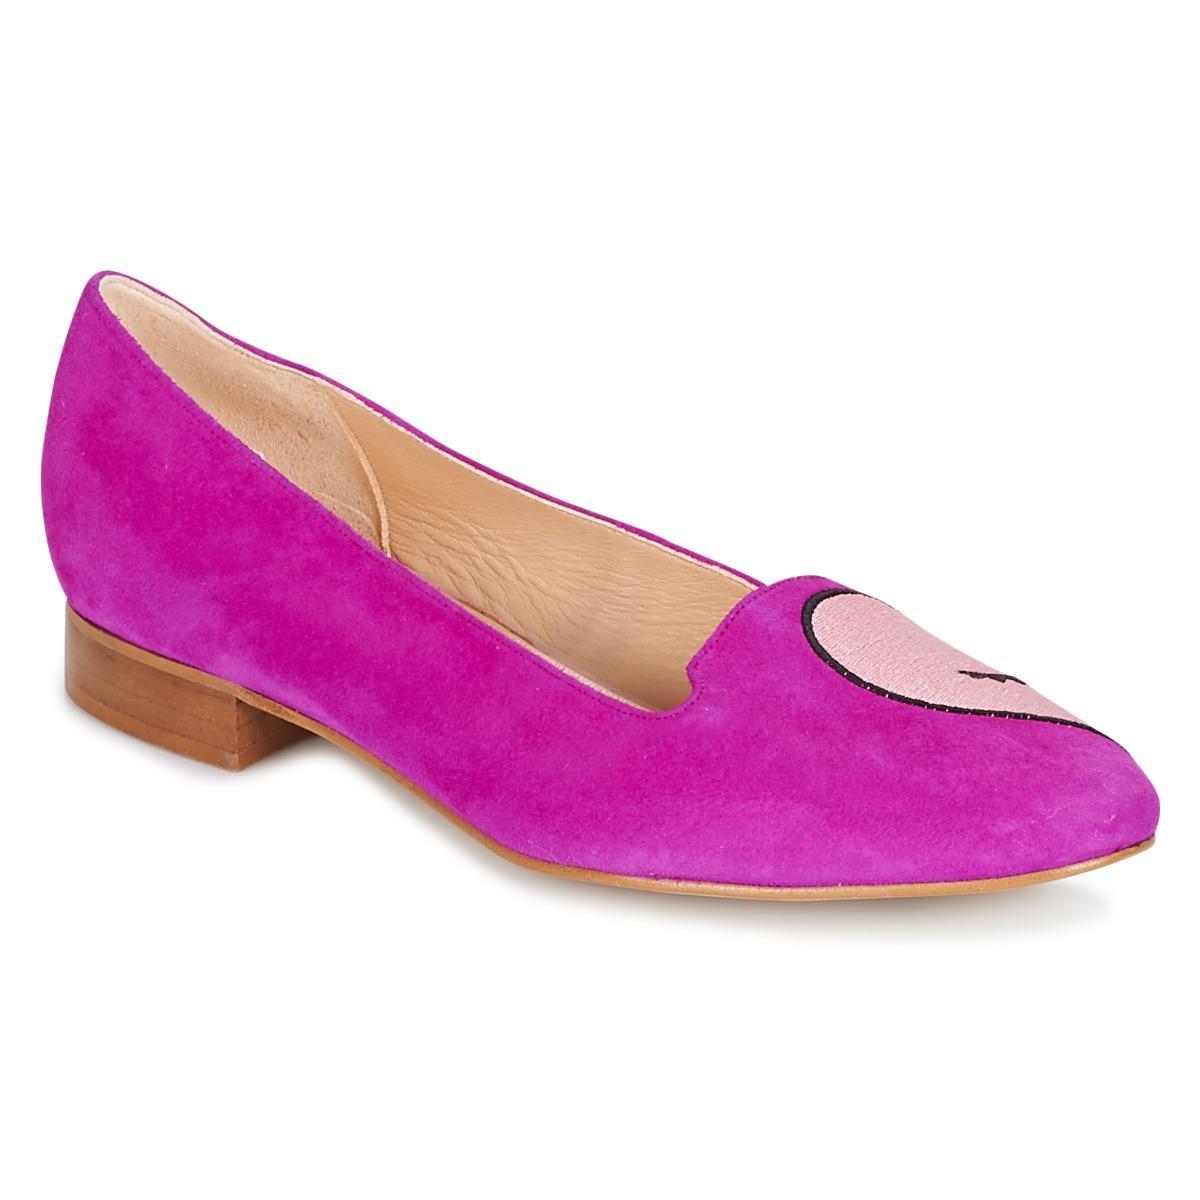 Mellow Pink Dreccy Yellow Shoespumps BallerinasIn Women's PXOkuTZi